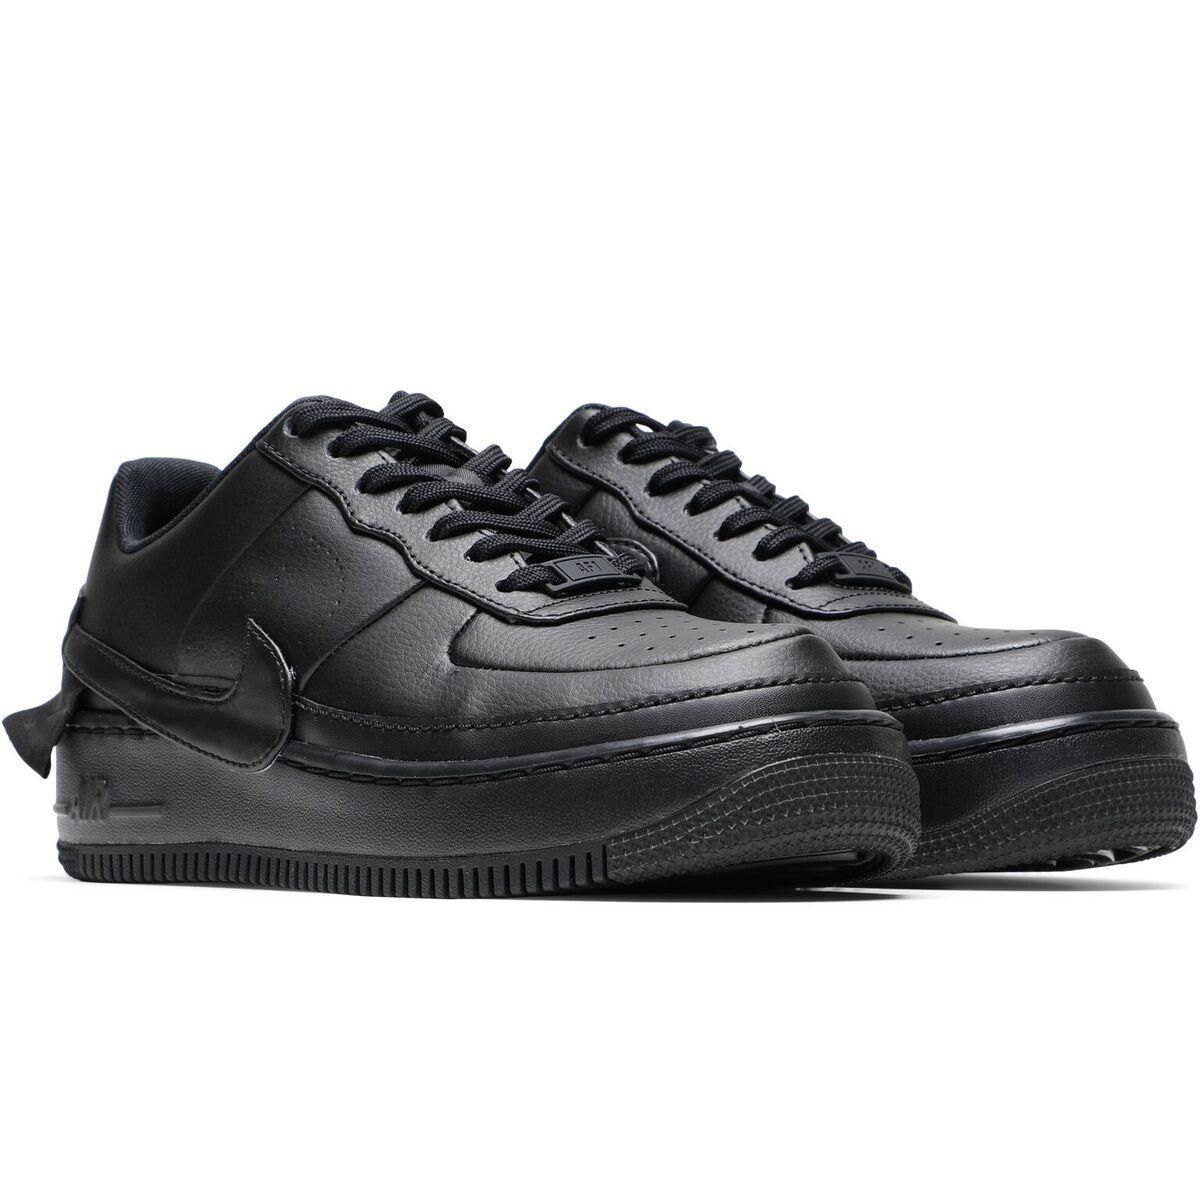 65200378fea7 Nike - Black Women s Air Force 1 Jester Xx - Lyst. View fullscreen